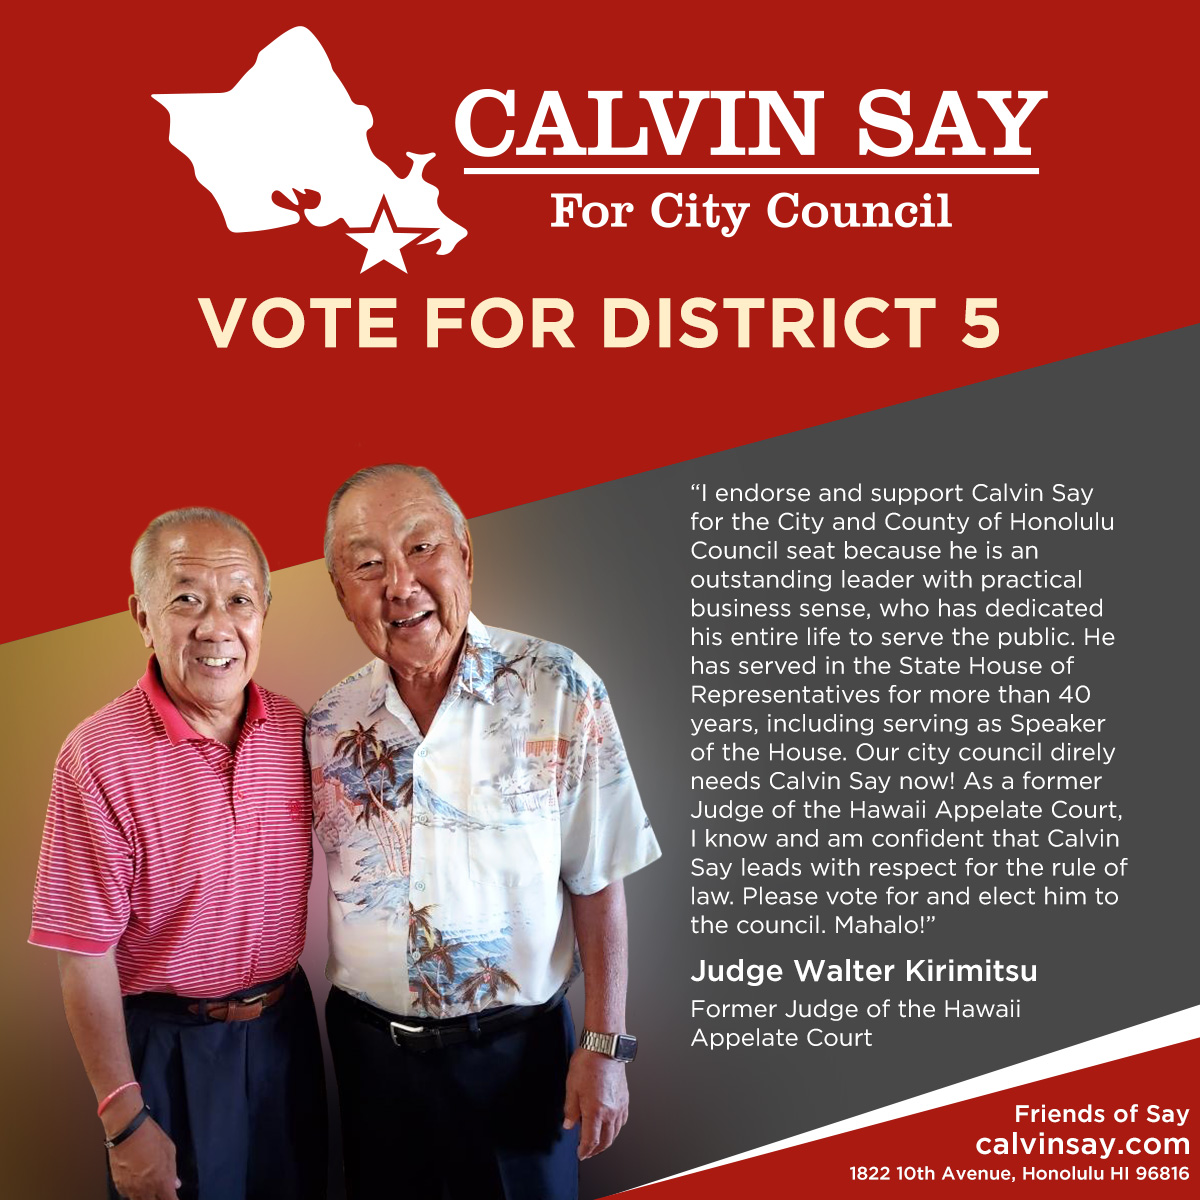 Judge Walter Kirimitsu's kind message in support of Speaker Emeritus Calvin K.Y. Say for Honolulu City Council District V.